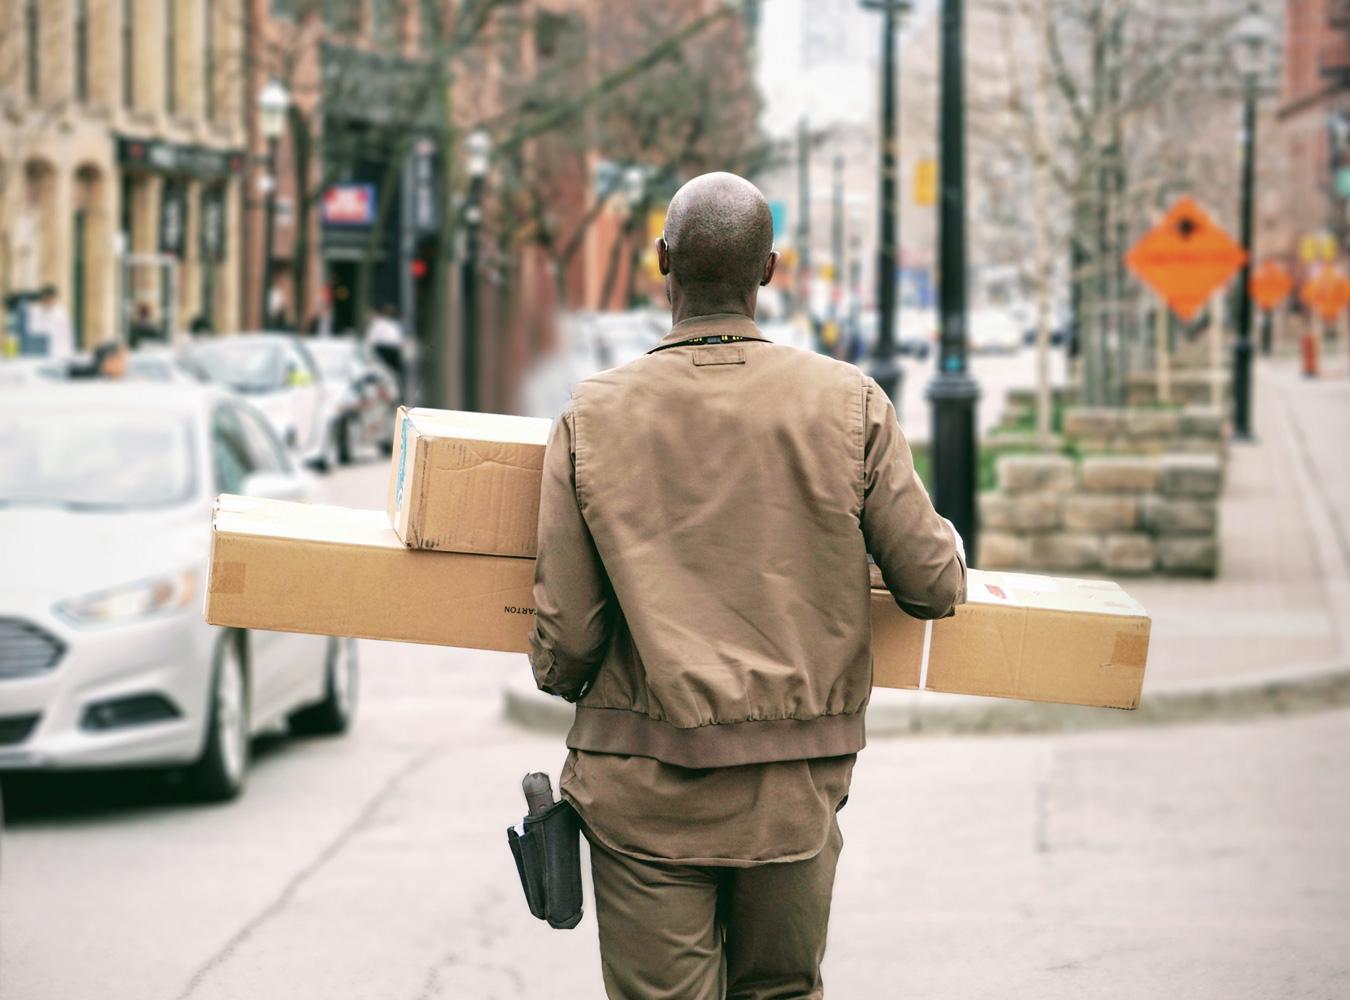 Logistics 4 Pharma - Service - Distribution - Preview; Image ©2017 Marten van den Heuvel